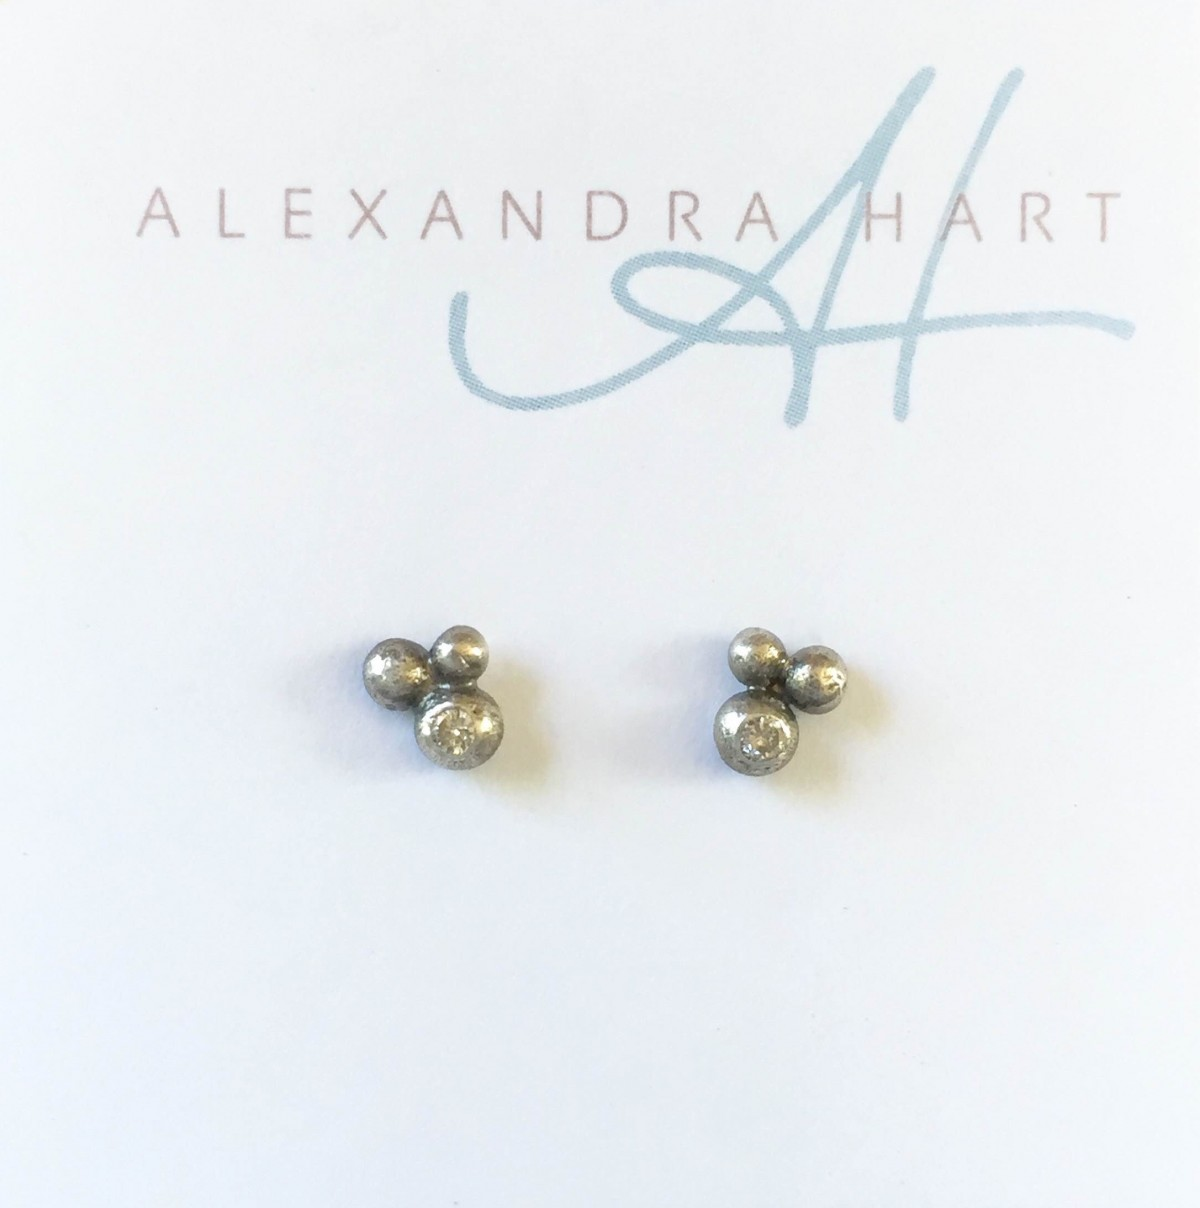 Tiny Pebble Earrings with Diamonds